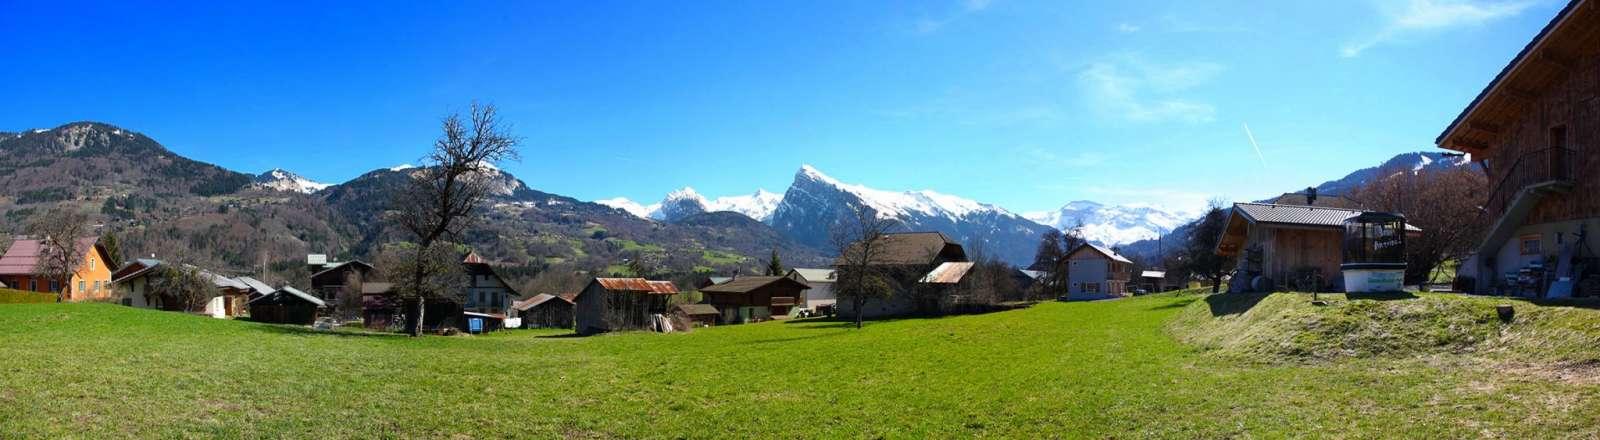 panorama-vallee-du-haut-giffre